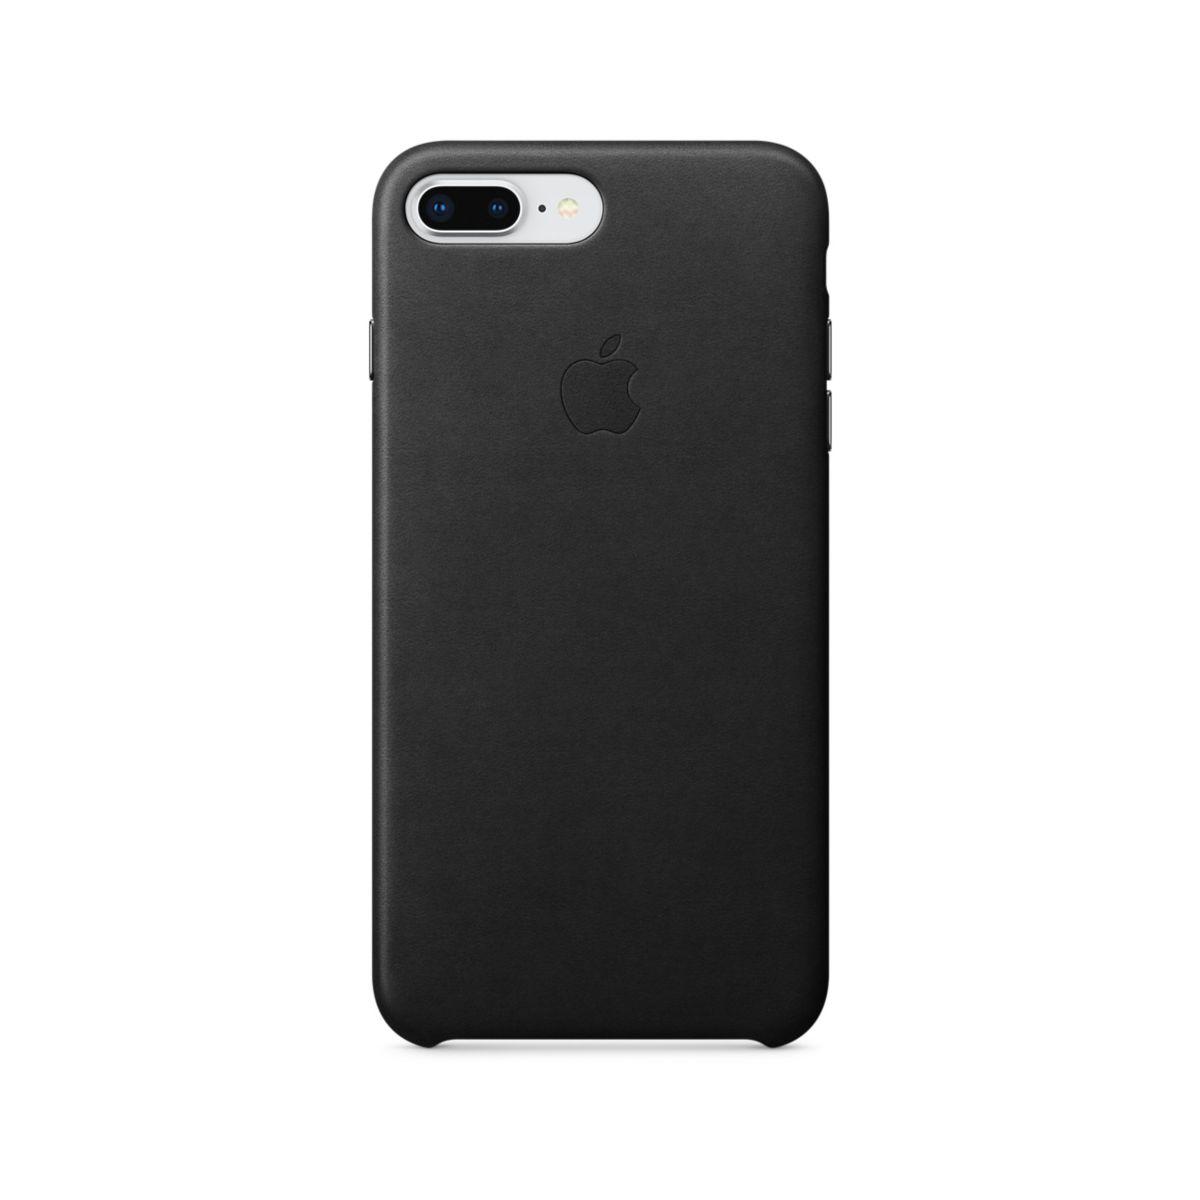 Coque APPLE iPhone 7/8 Plus cuir noir (photo)